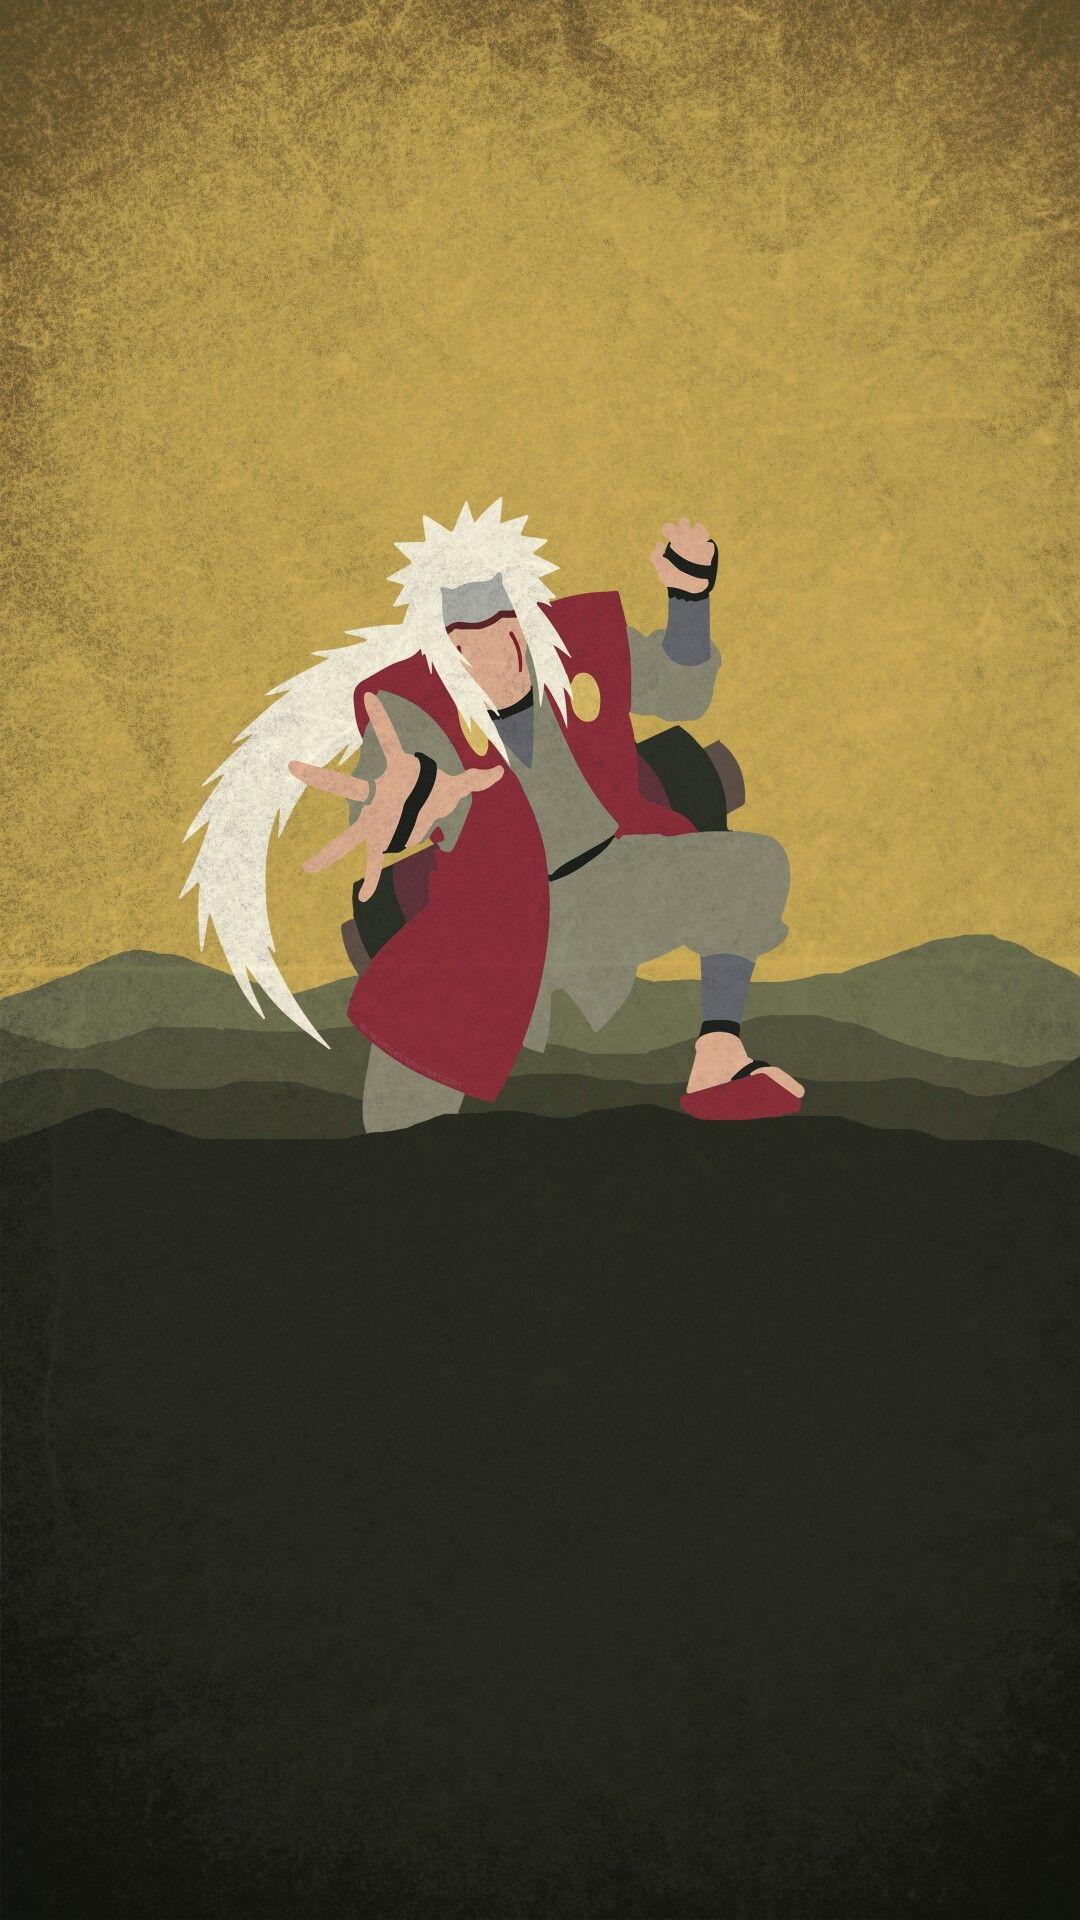 Top Wallpaper Naruto Art - ffab144e4a545b643d6d6f5b93adf342  Collection_21821.jpg